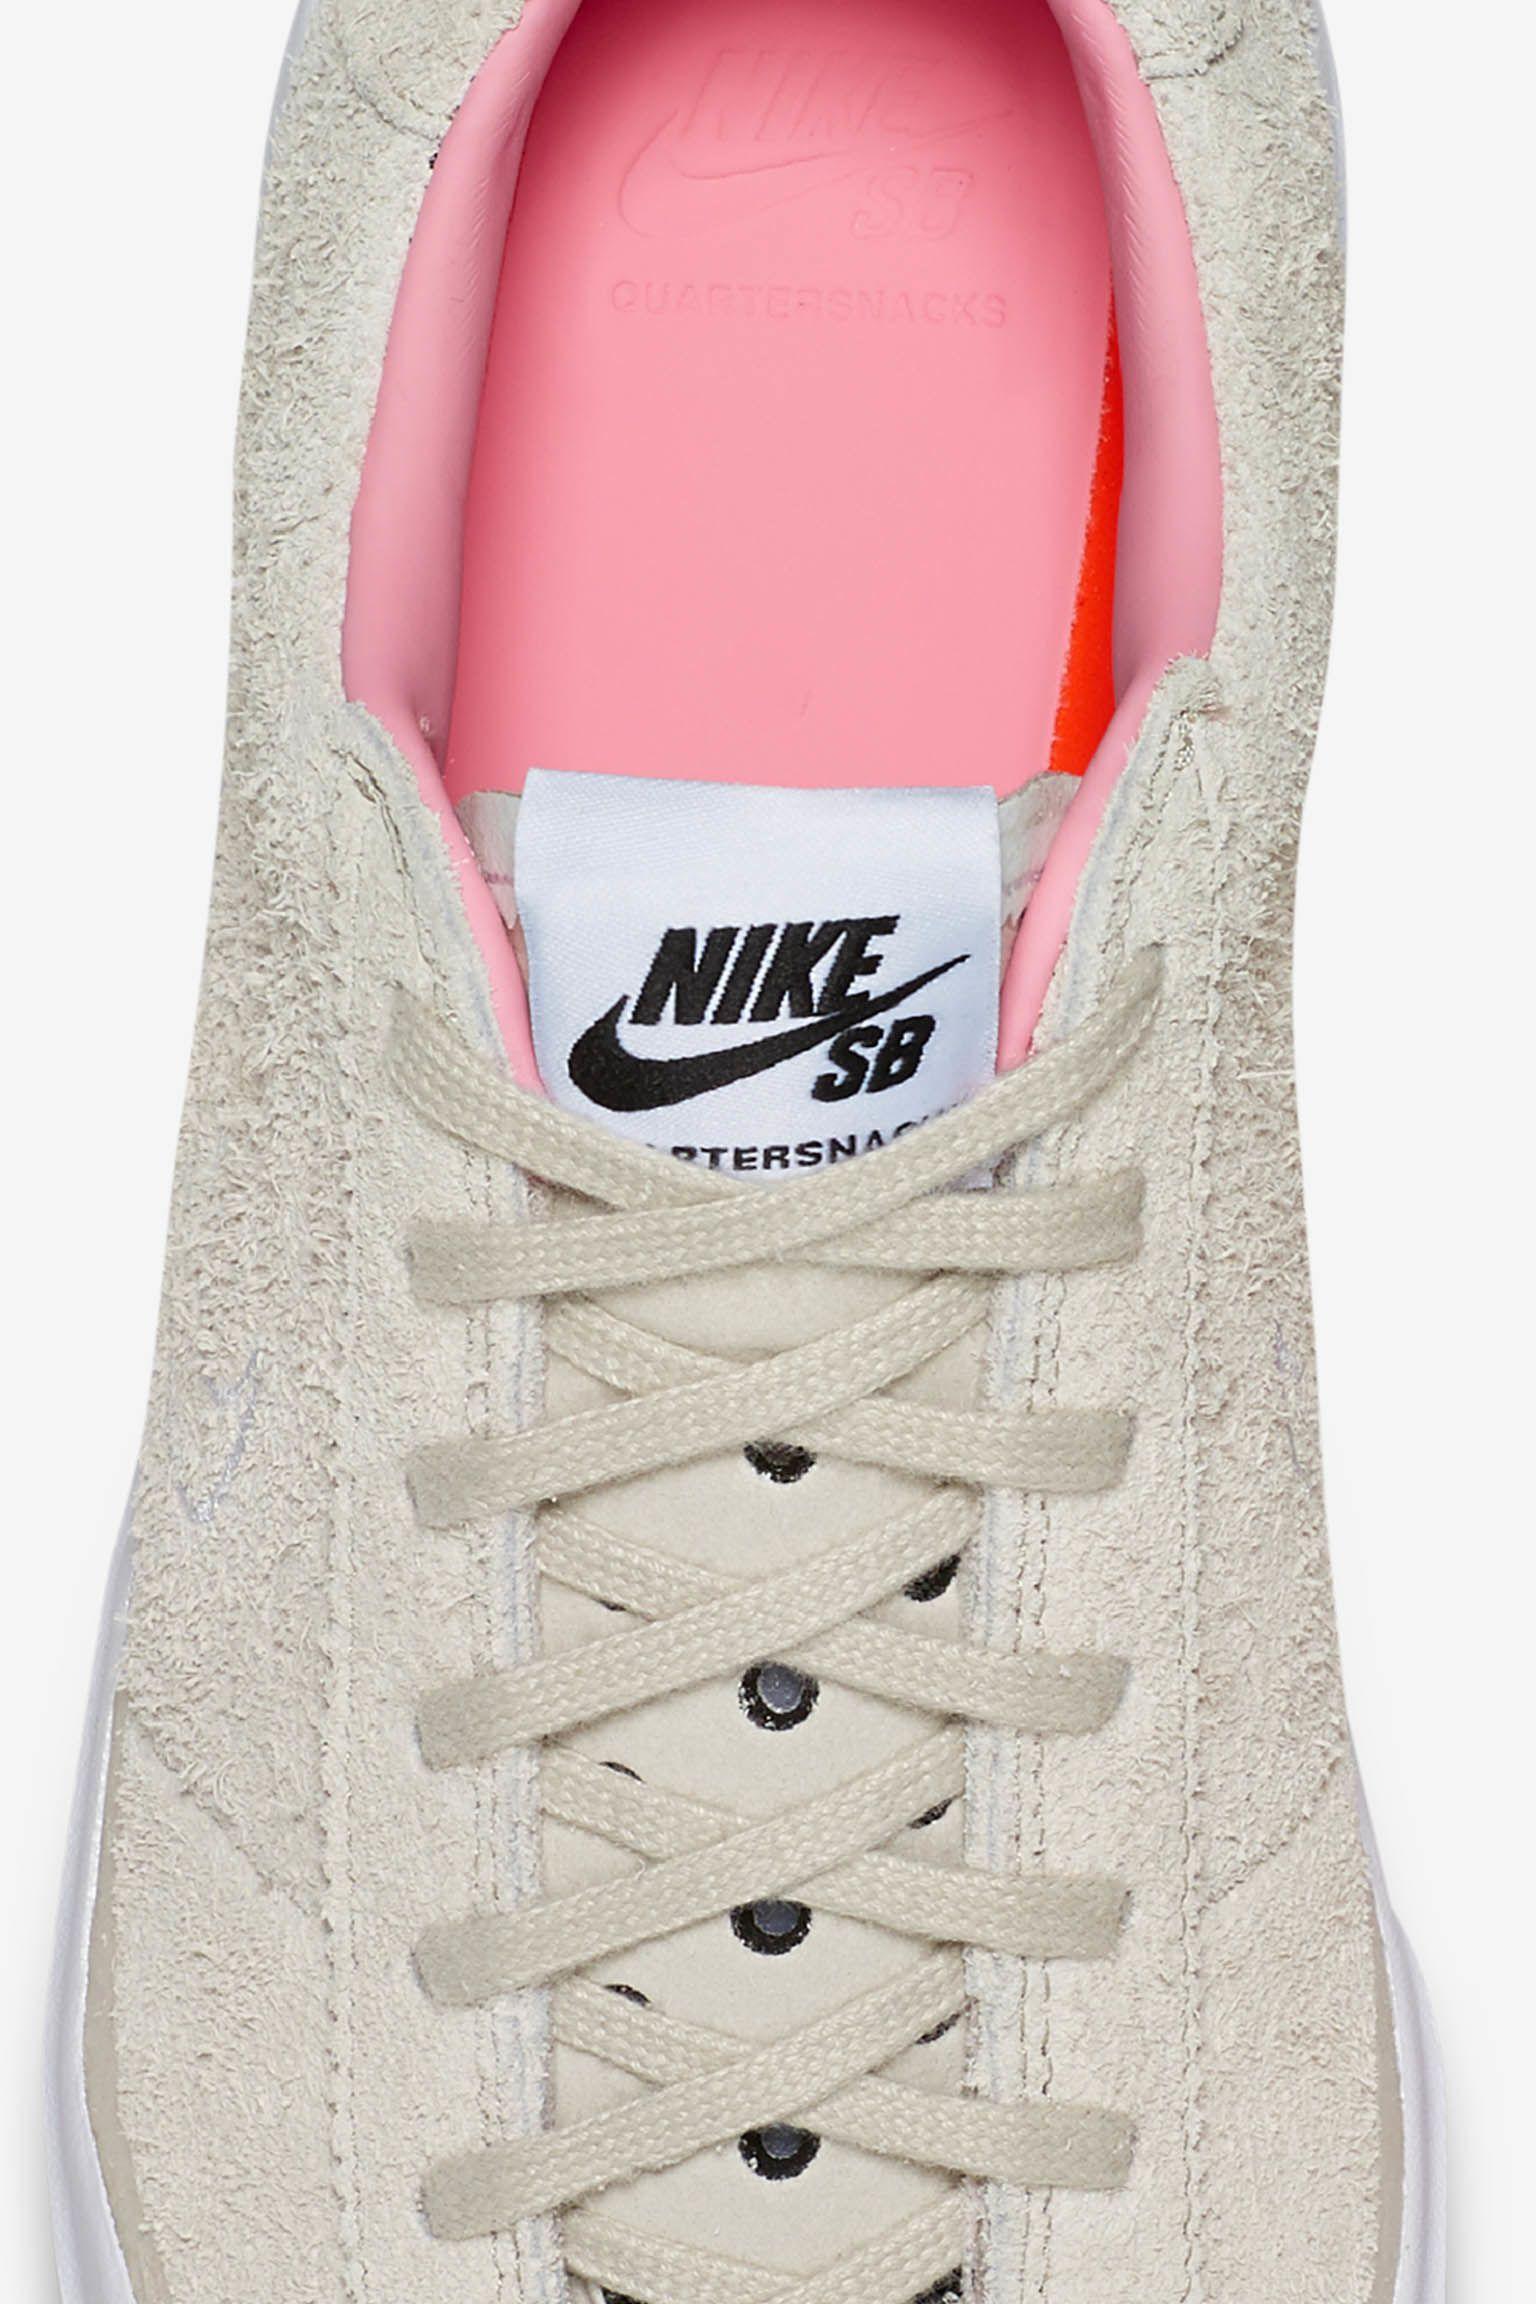 Nike SB Bruin Hyperfeel x Quartersnacks Release Date